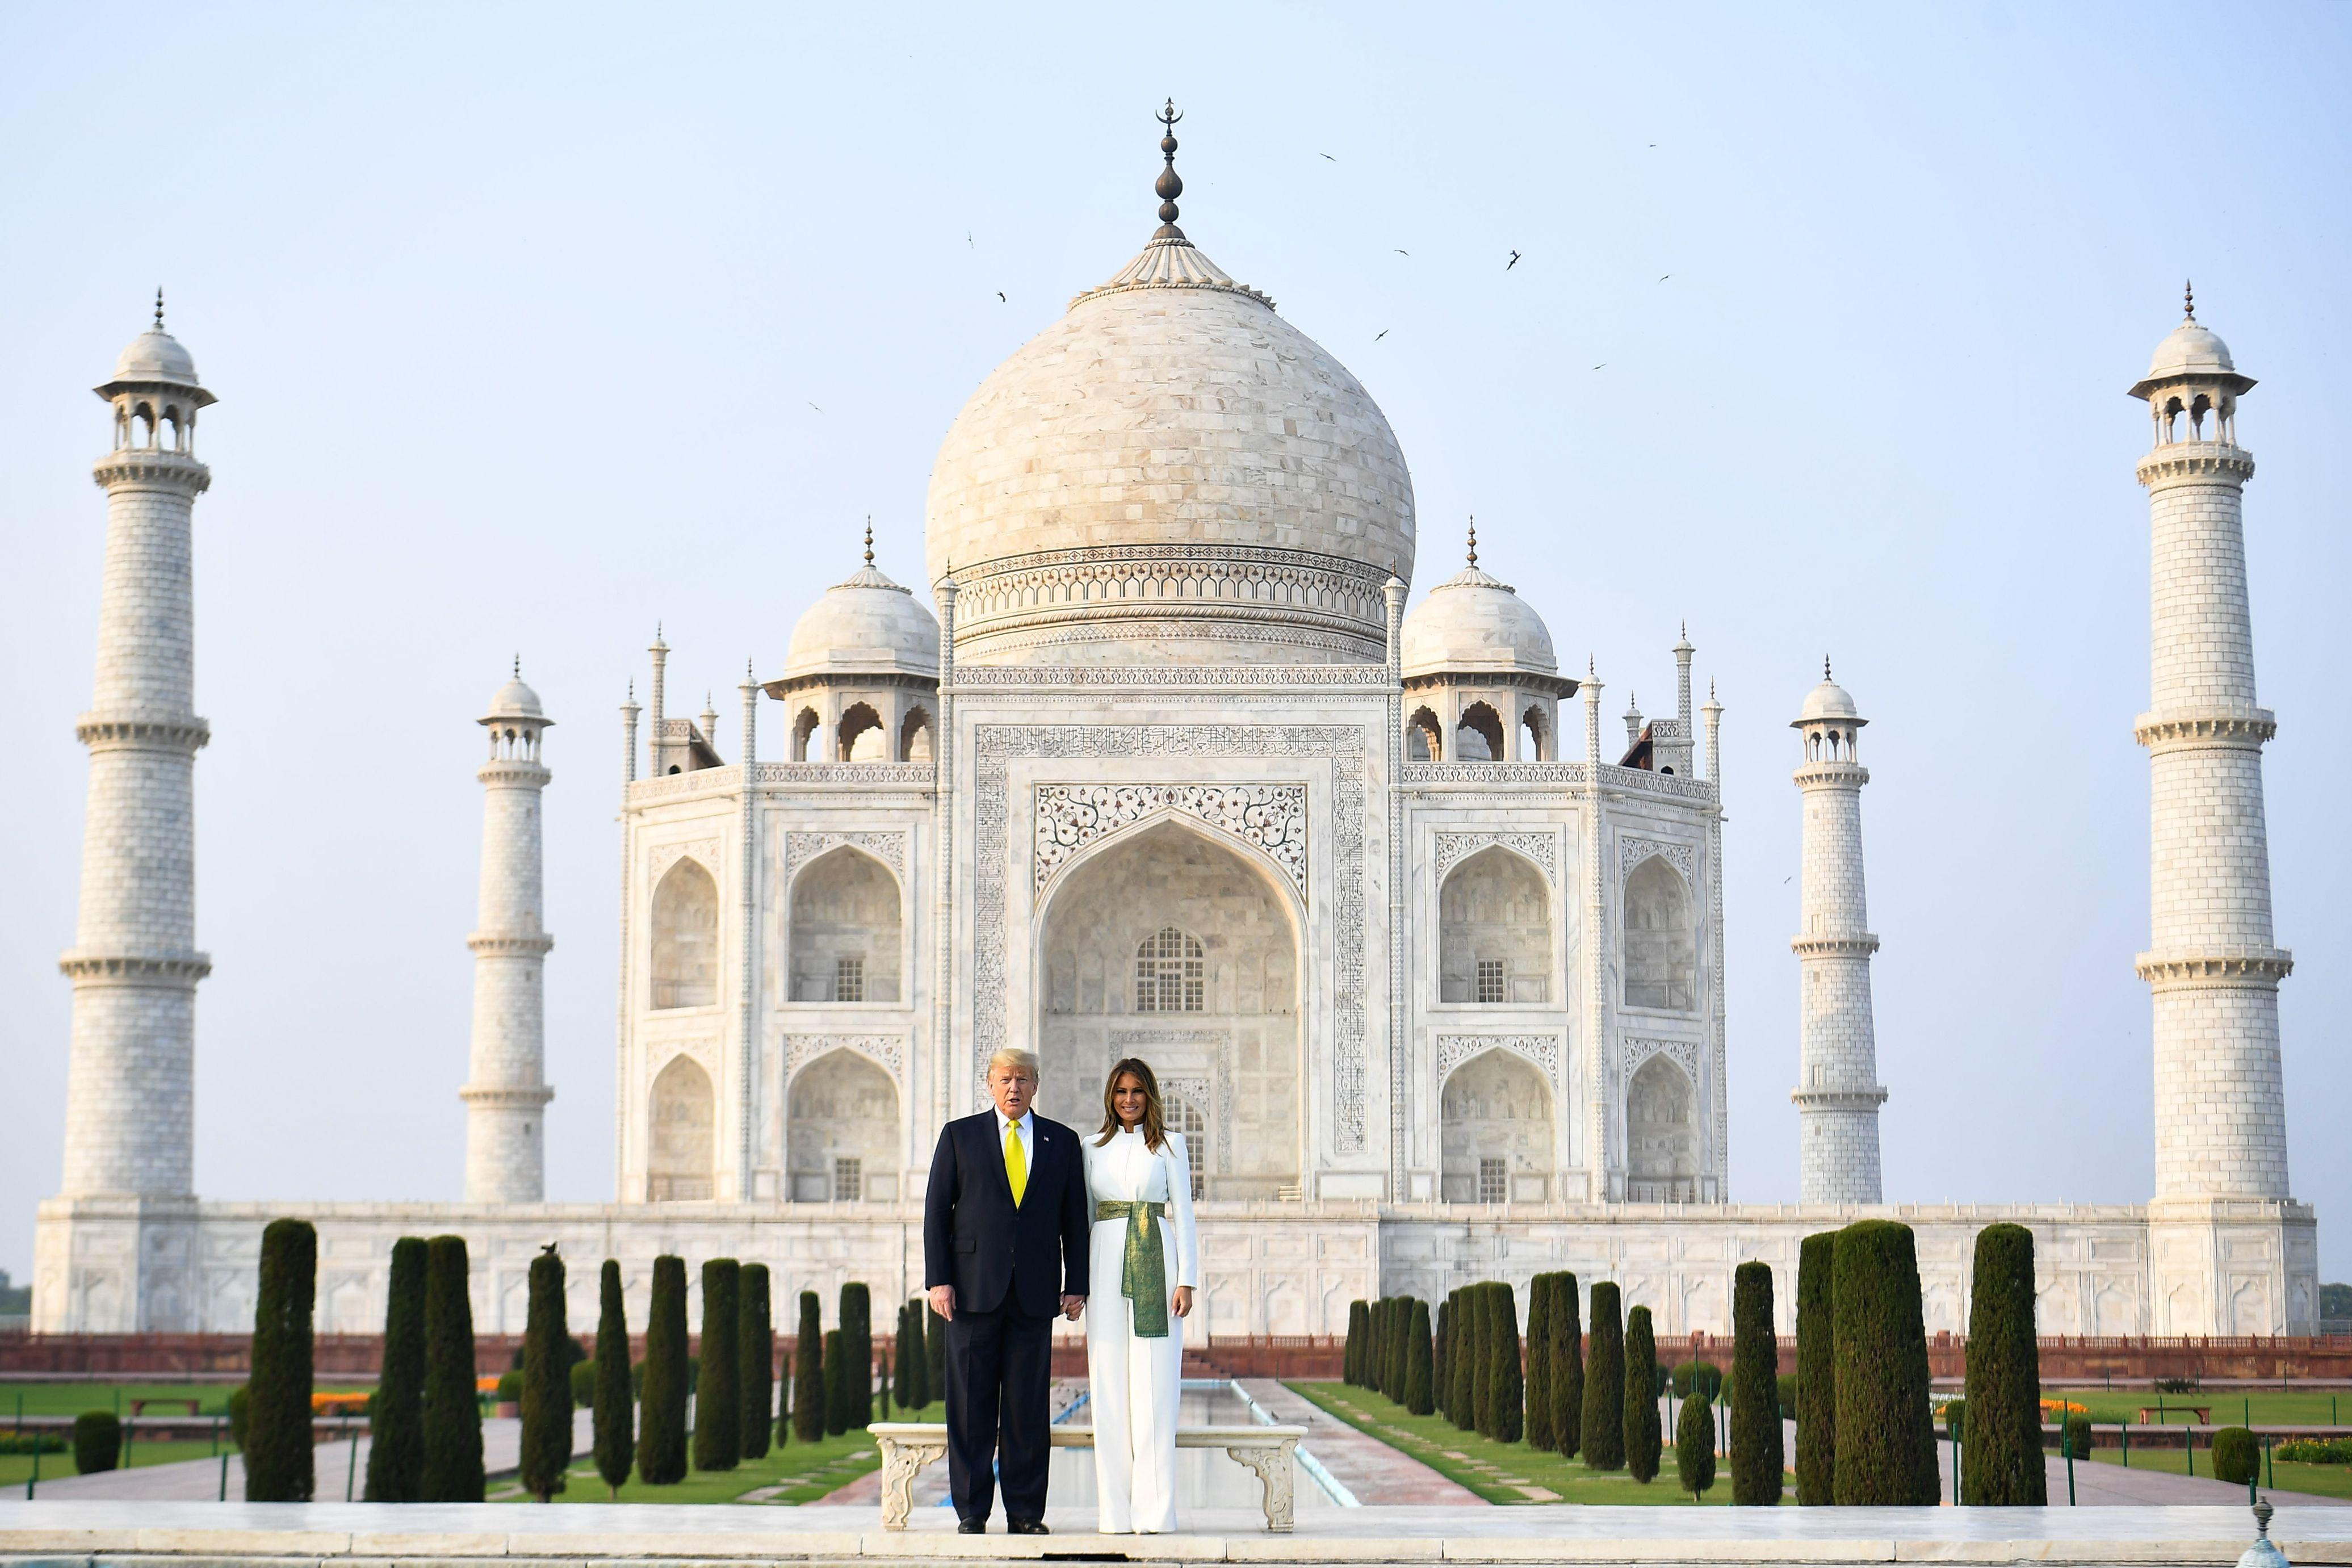 In photos: Trump visits Taj Mahal after massive rally in India - Axios